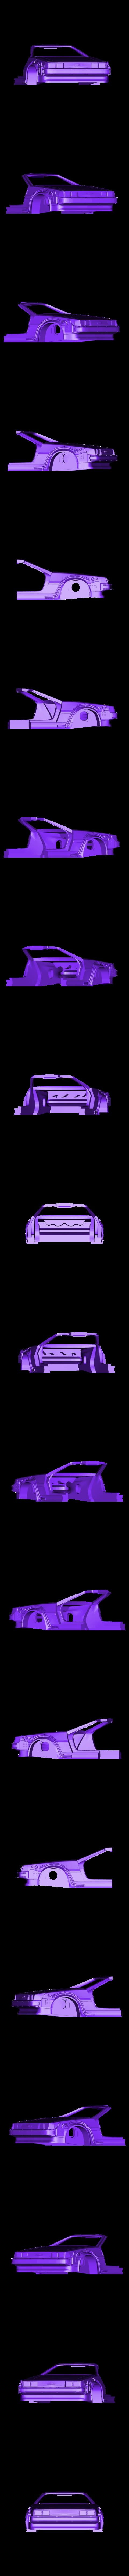 front_trans.stl Download free STL file DIY DeLorean Time Machine with lights!! • 3D printer model, OneIdMONstr